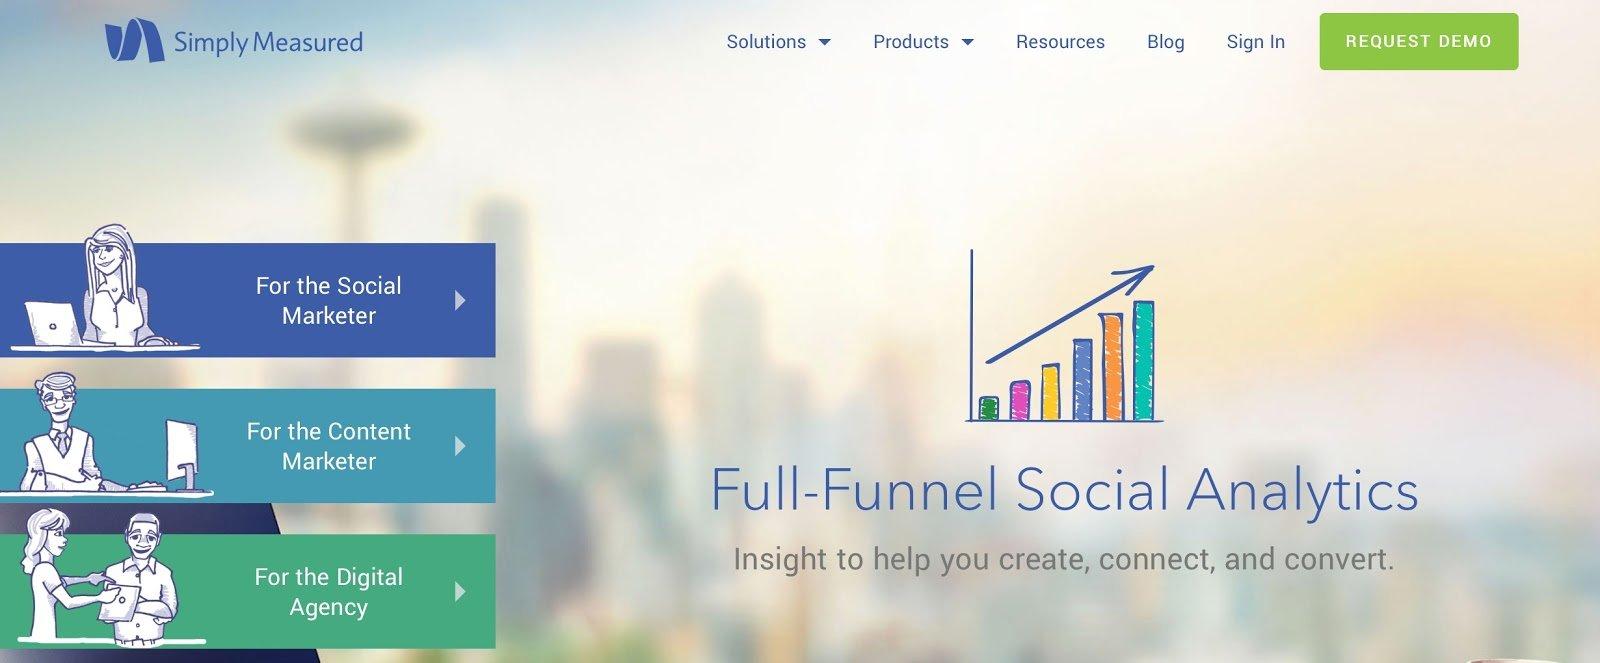 Full Funnel Social Analytics Simply Measured